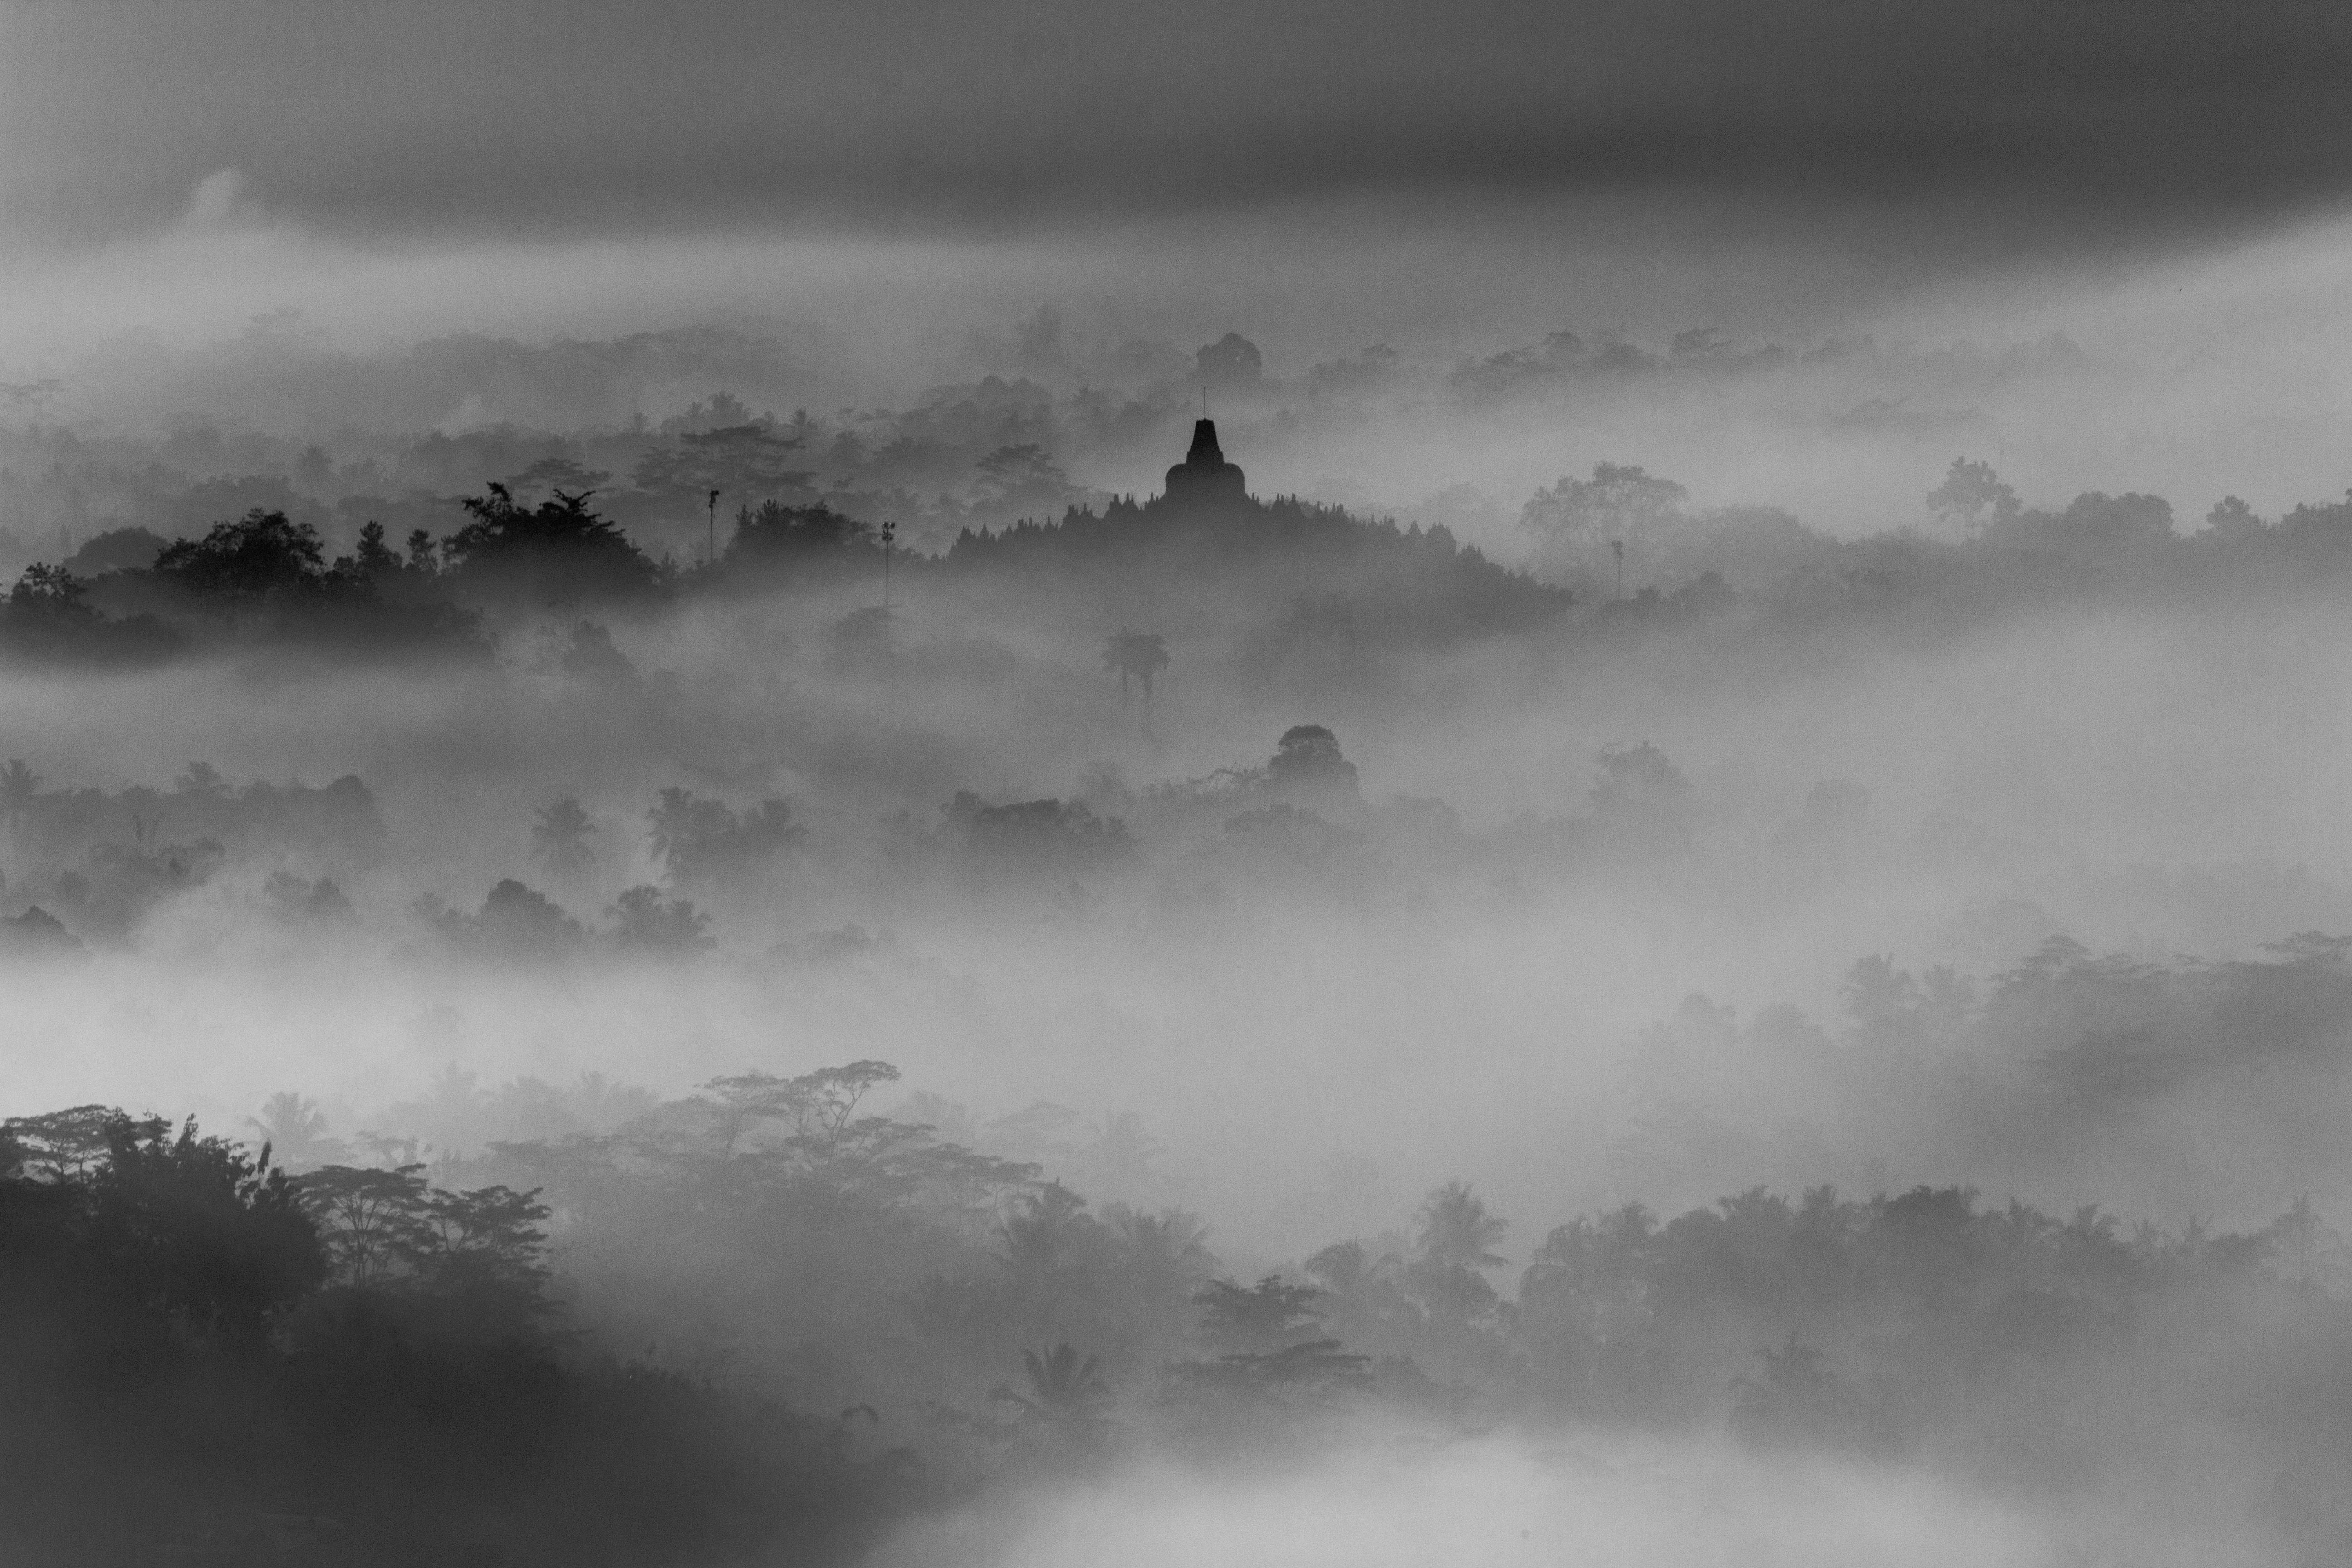 черный туман картинки обычно